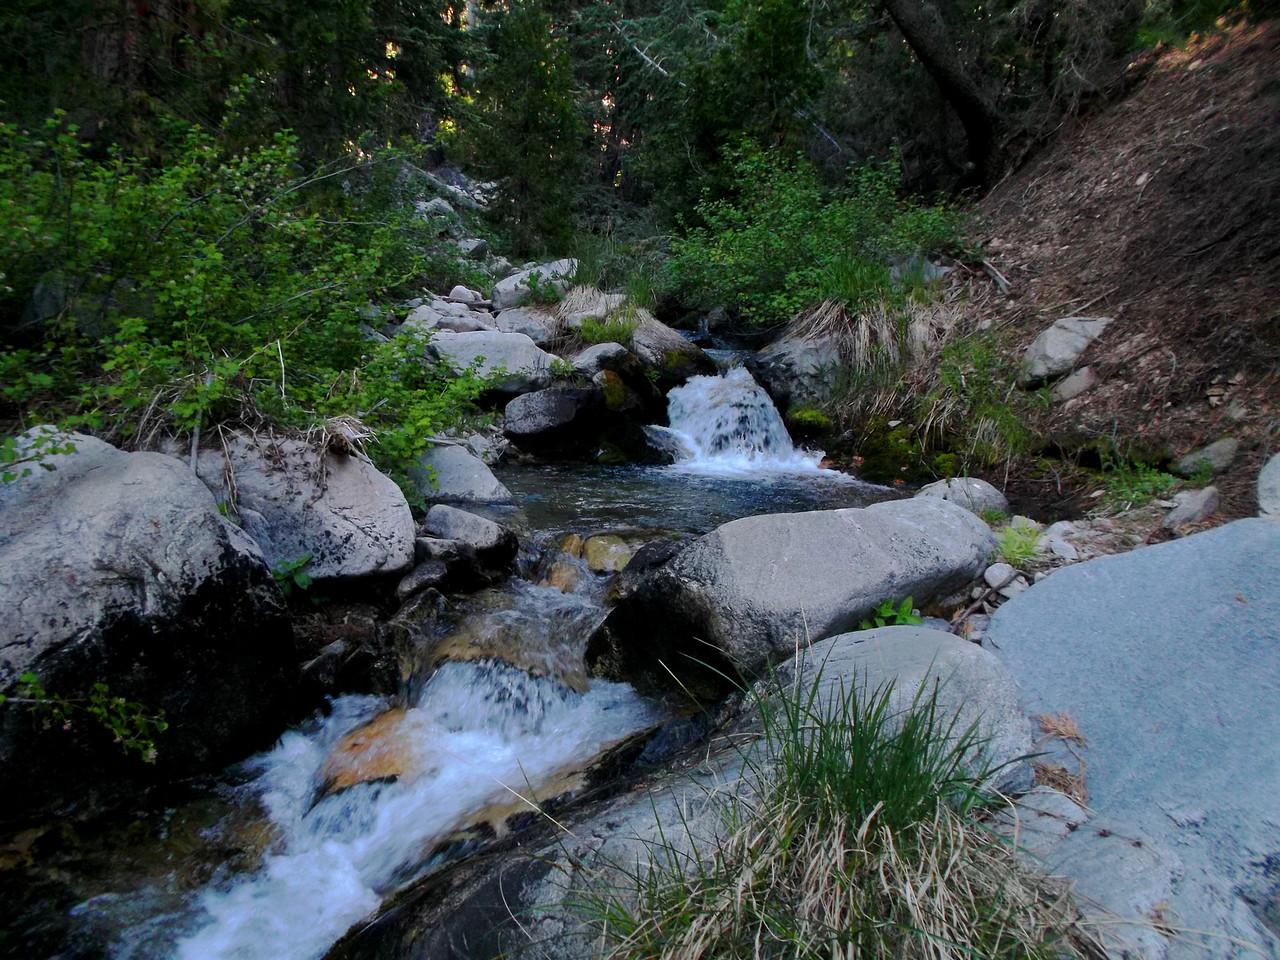 East Fork Falls Creek at Dobbs Camp